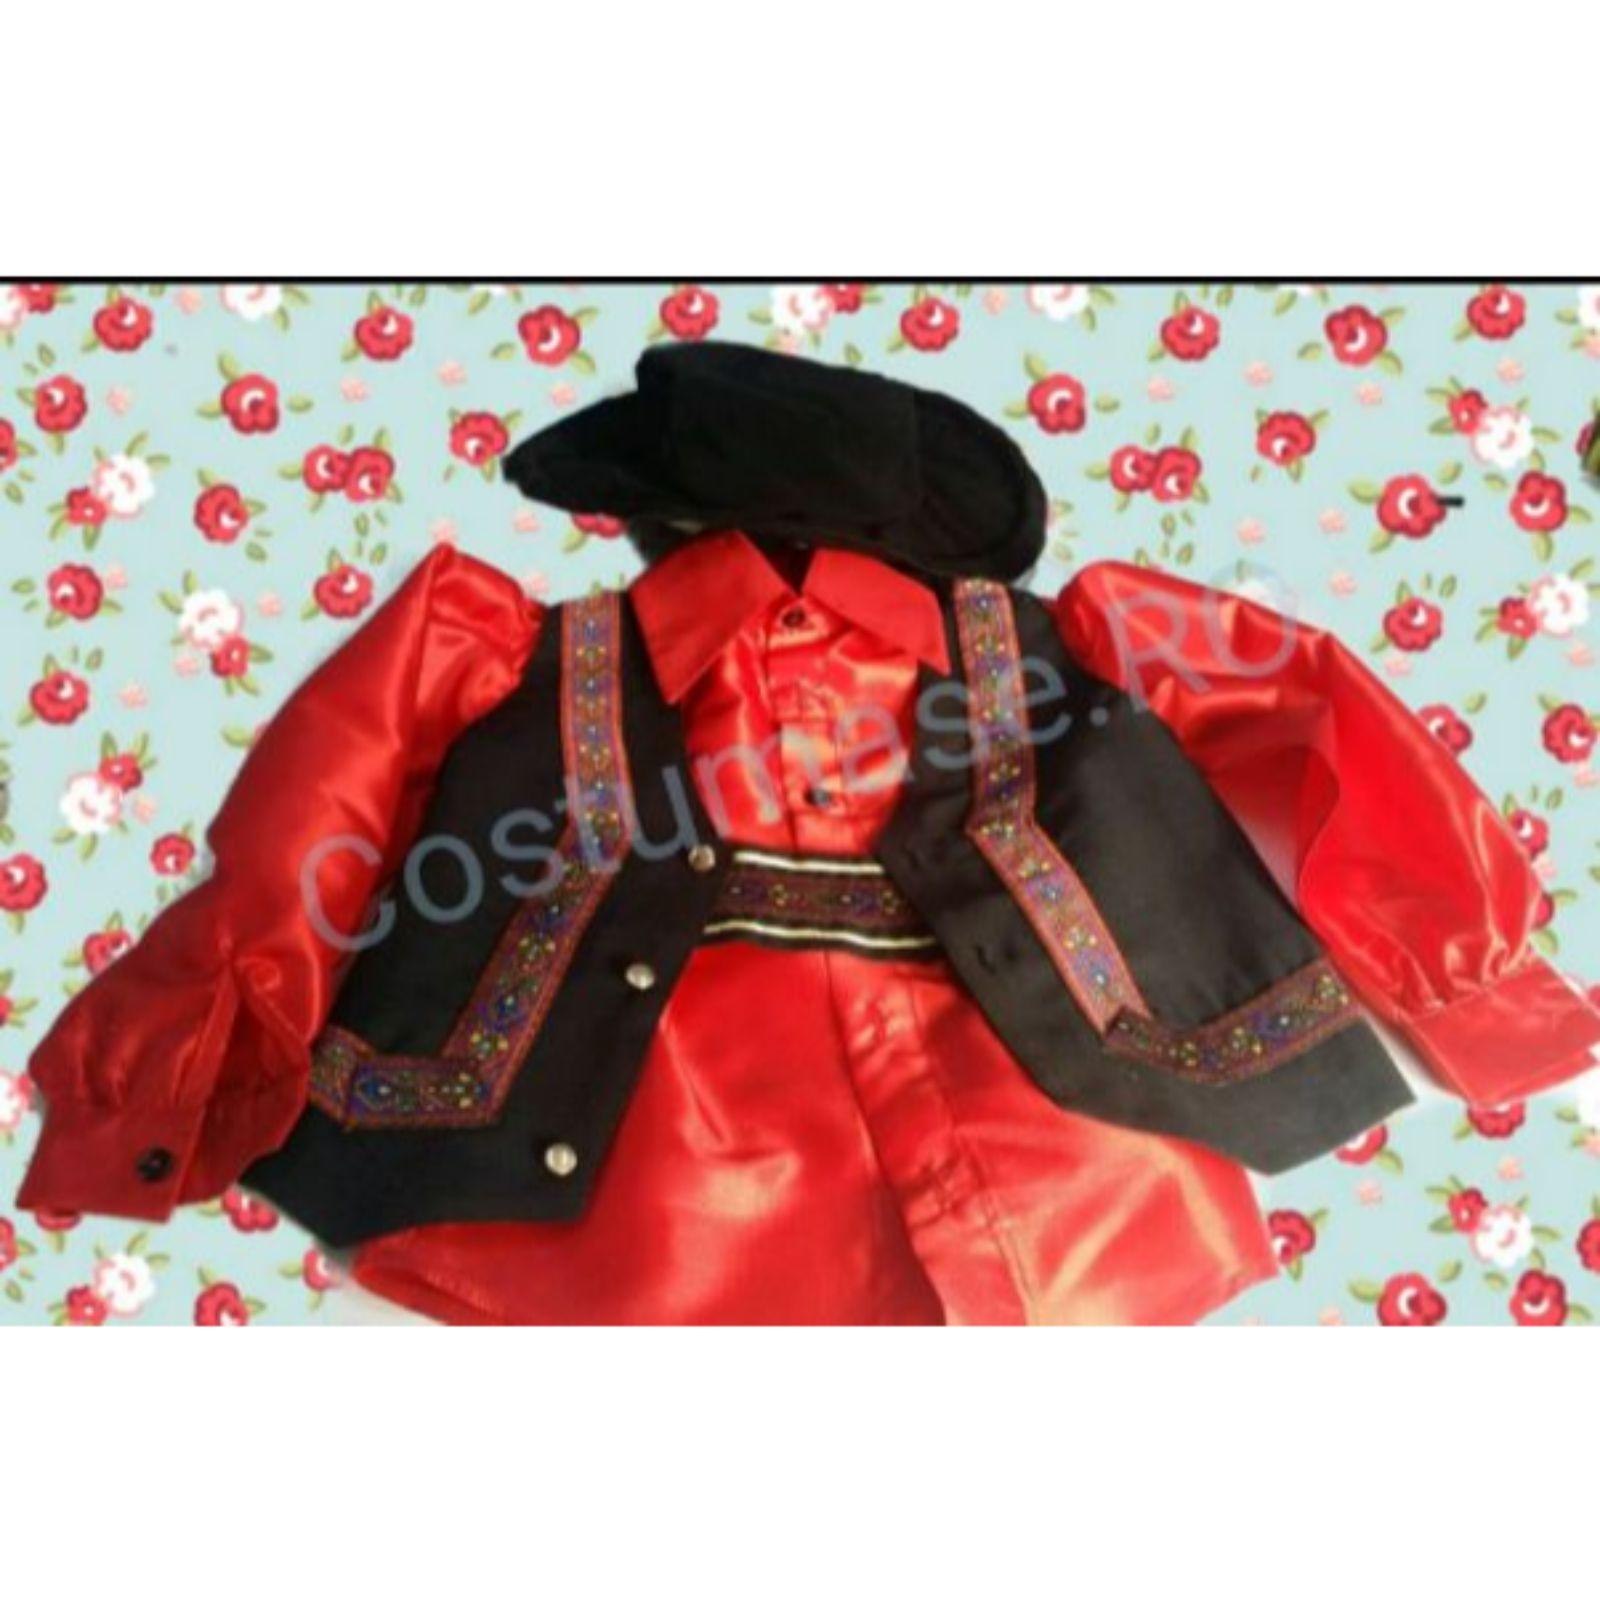 Costum țigan - roșu cu aplicații